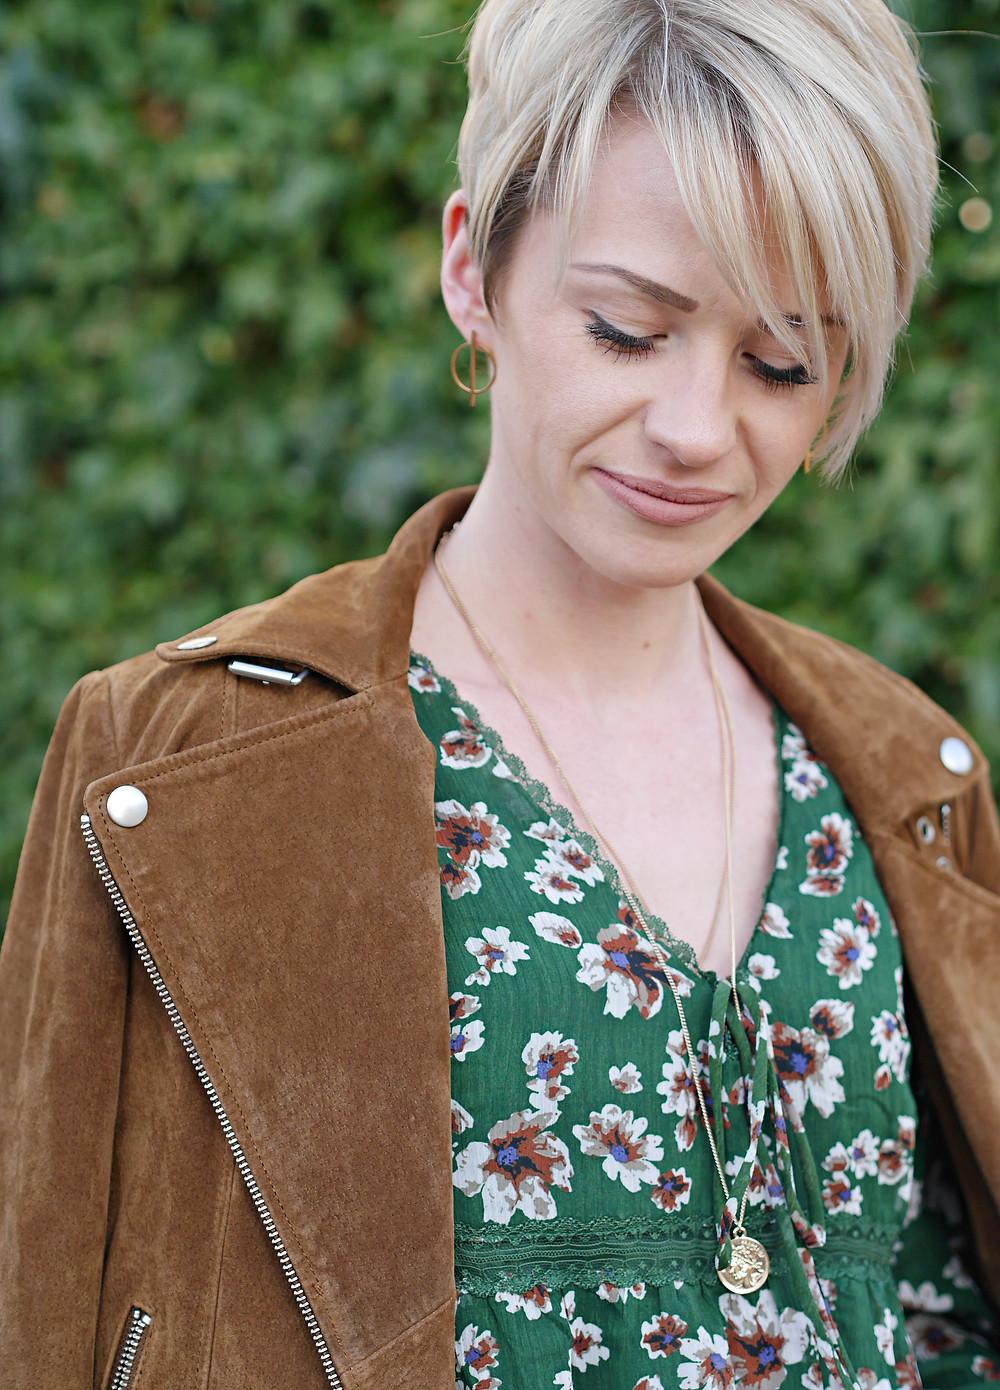 le blog des filles in blog mode caen normandie